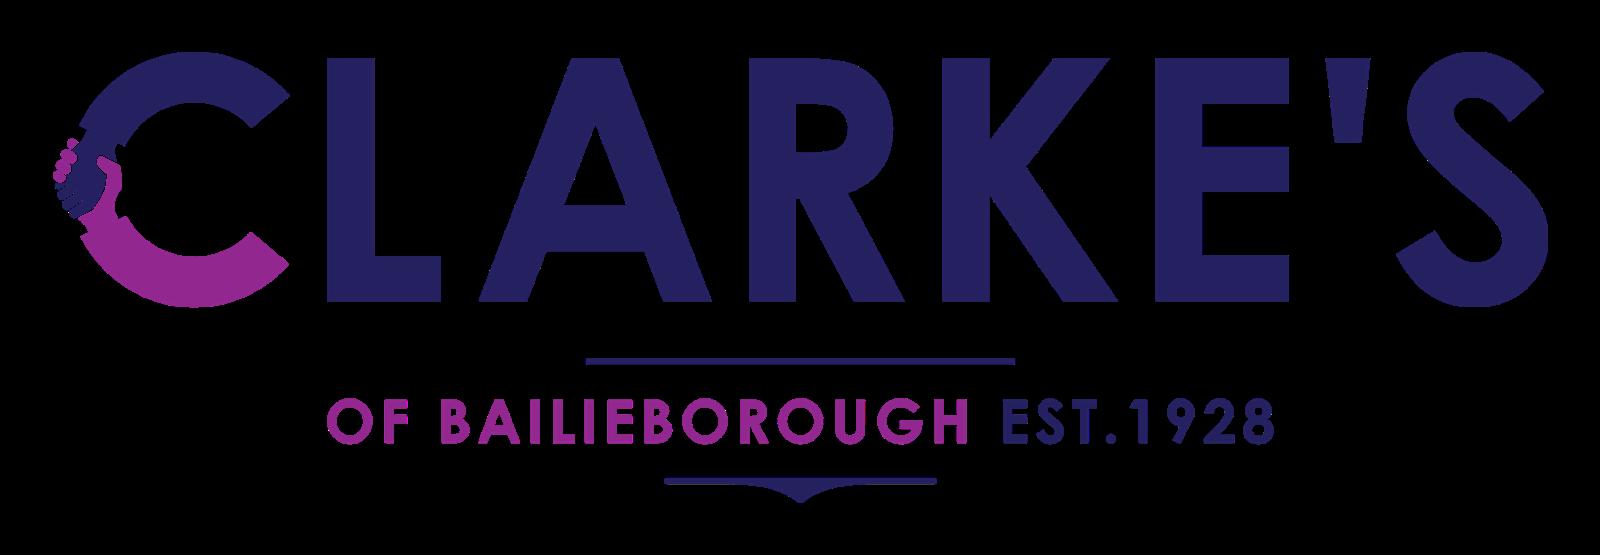 Clarkes Department Store Logo